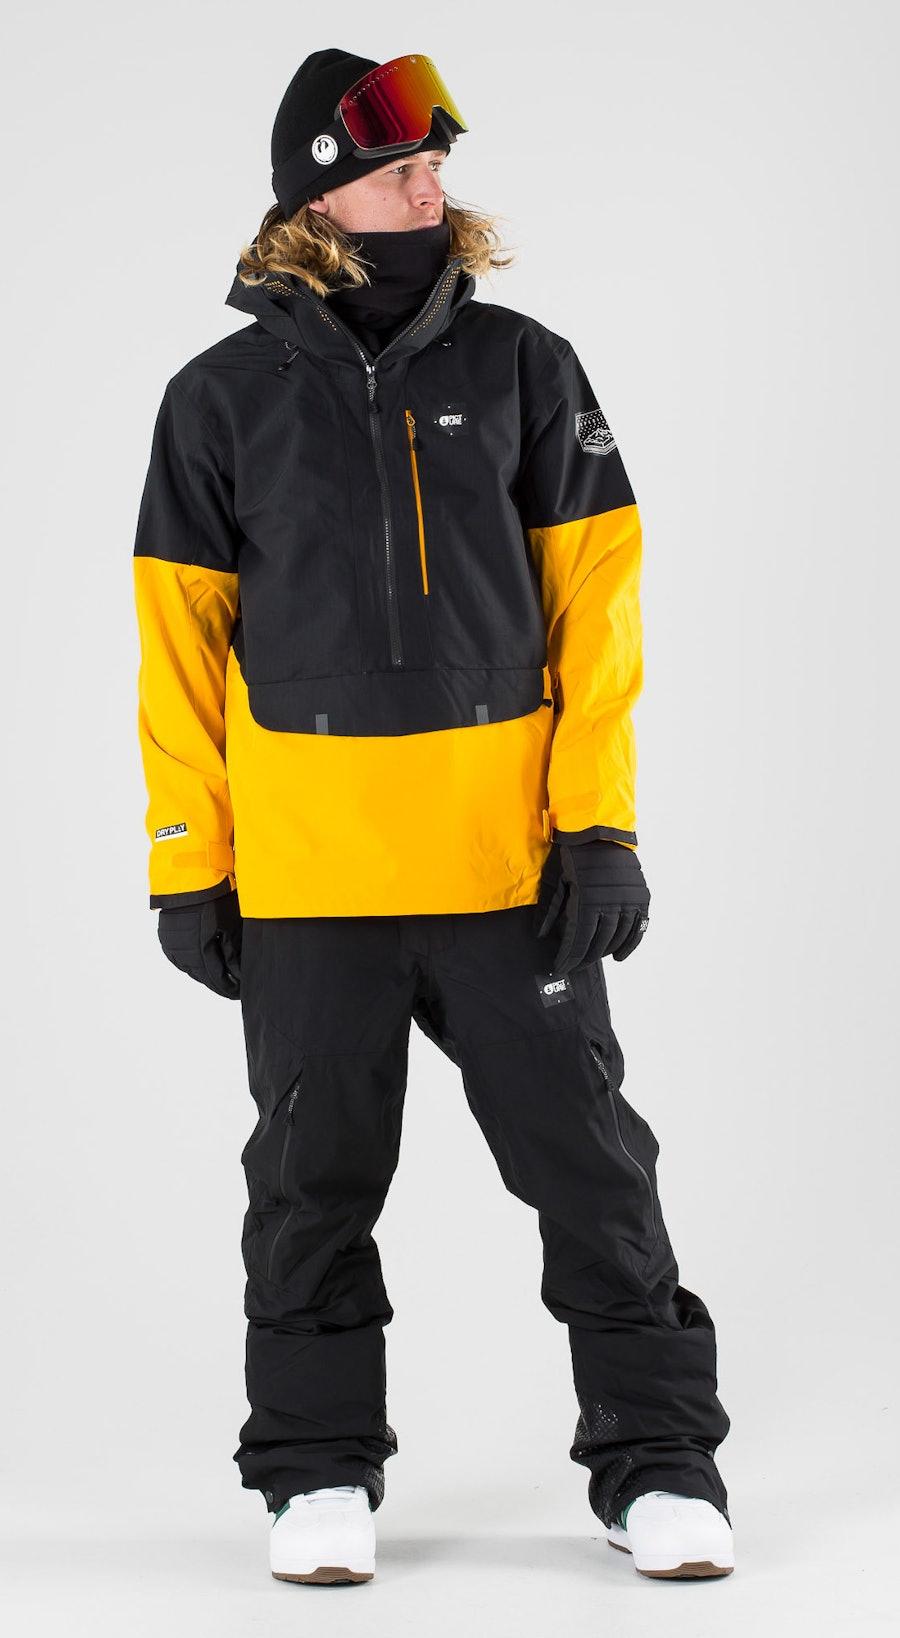 Picture Anton Black Yellow Snowboardkläder Multi